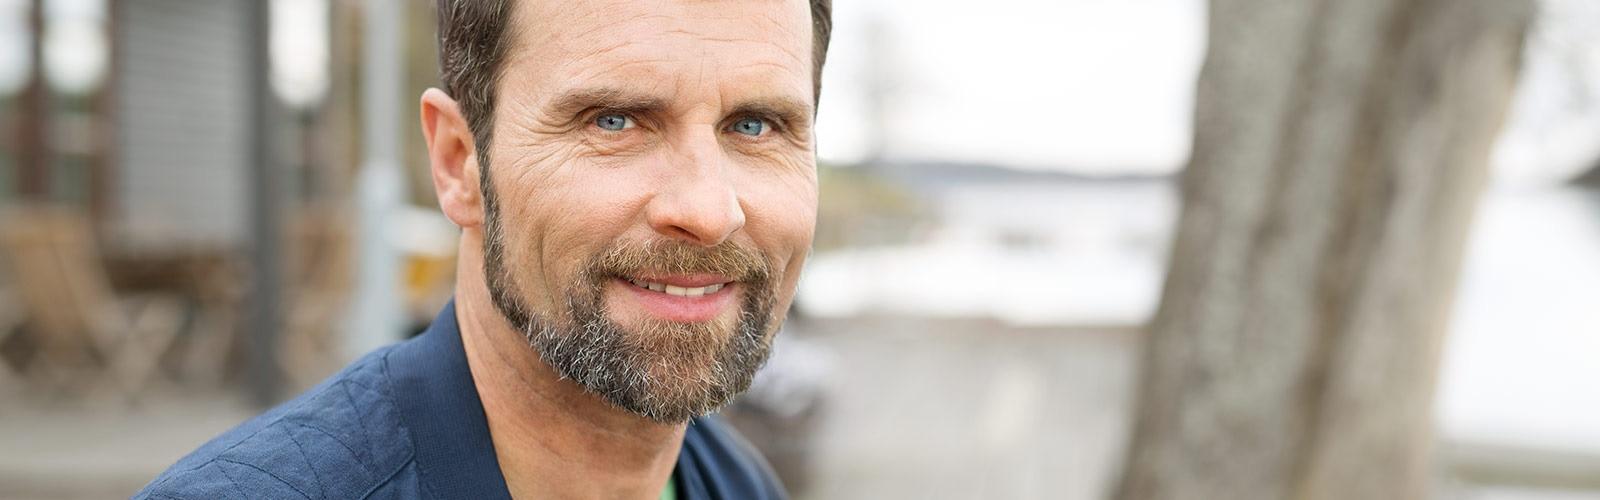 Uomo con la barba che sorride